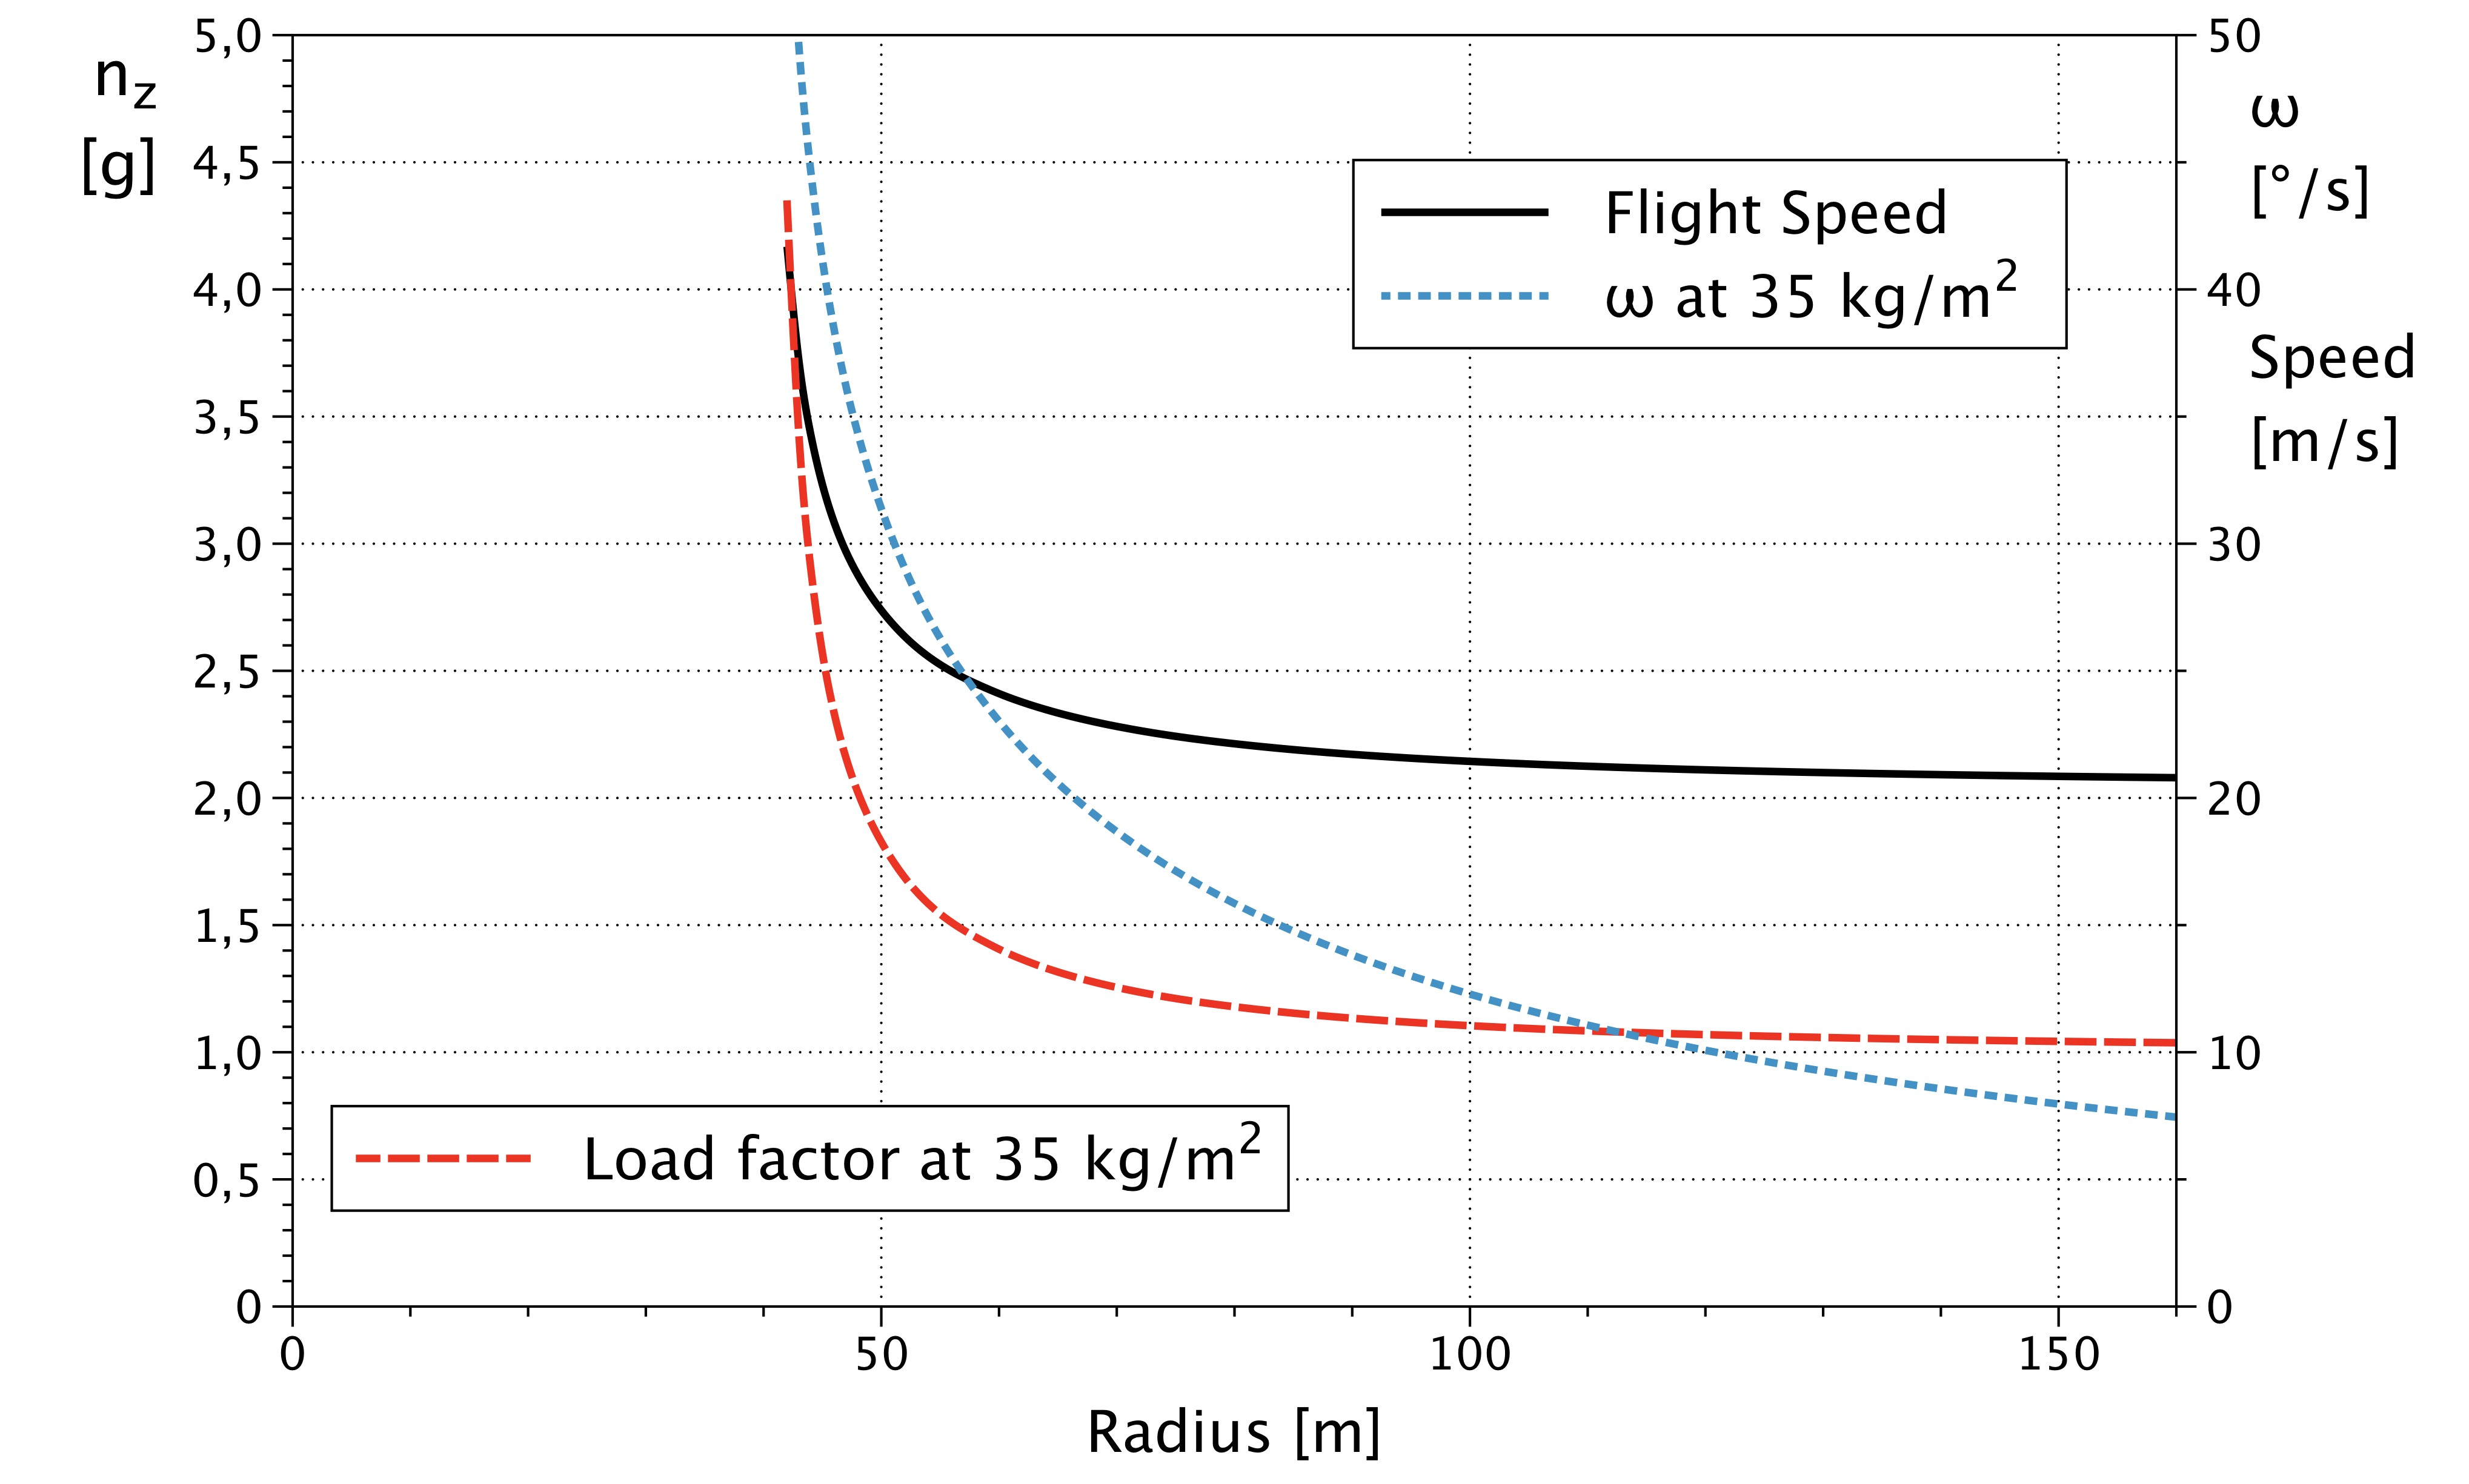 Car Turning Radius Diagram Aerodynamics How to Calculate Angular Velocity and Radius Of A Of Car Turning Radius Diagram